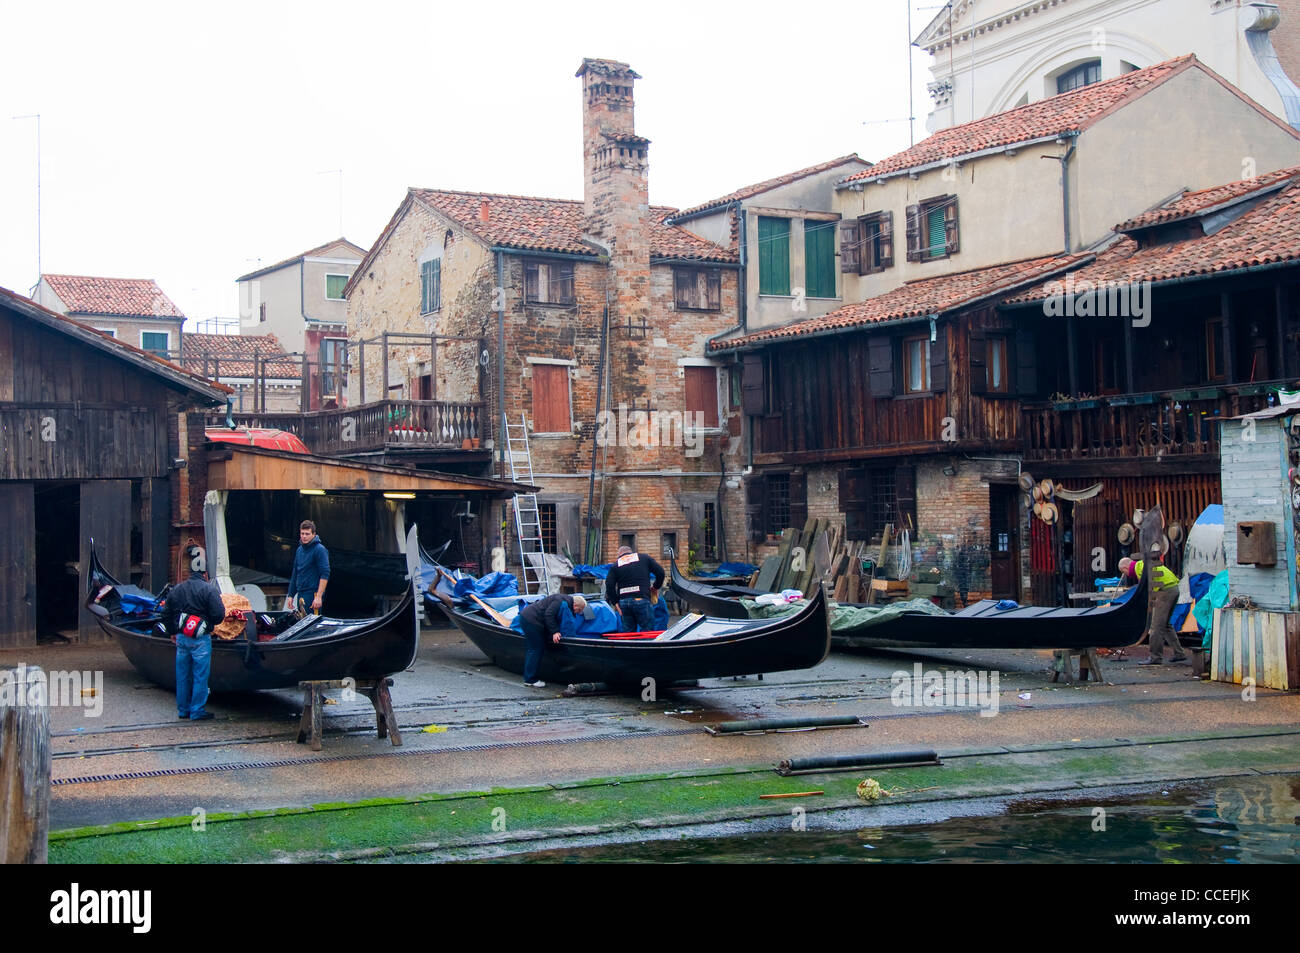 Gondolas being repaired, Venice, Italy - Stock Image